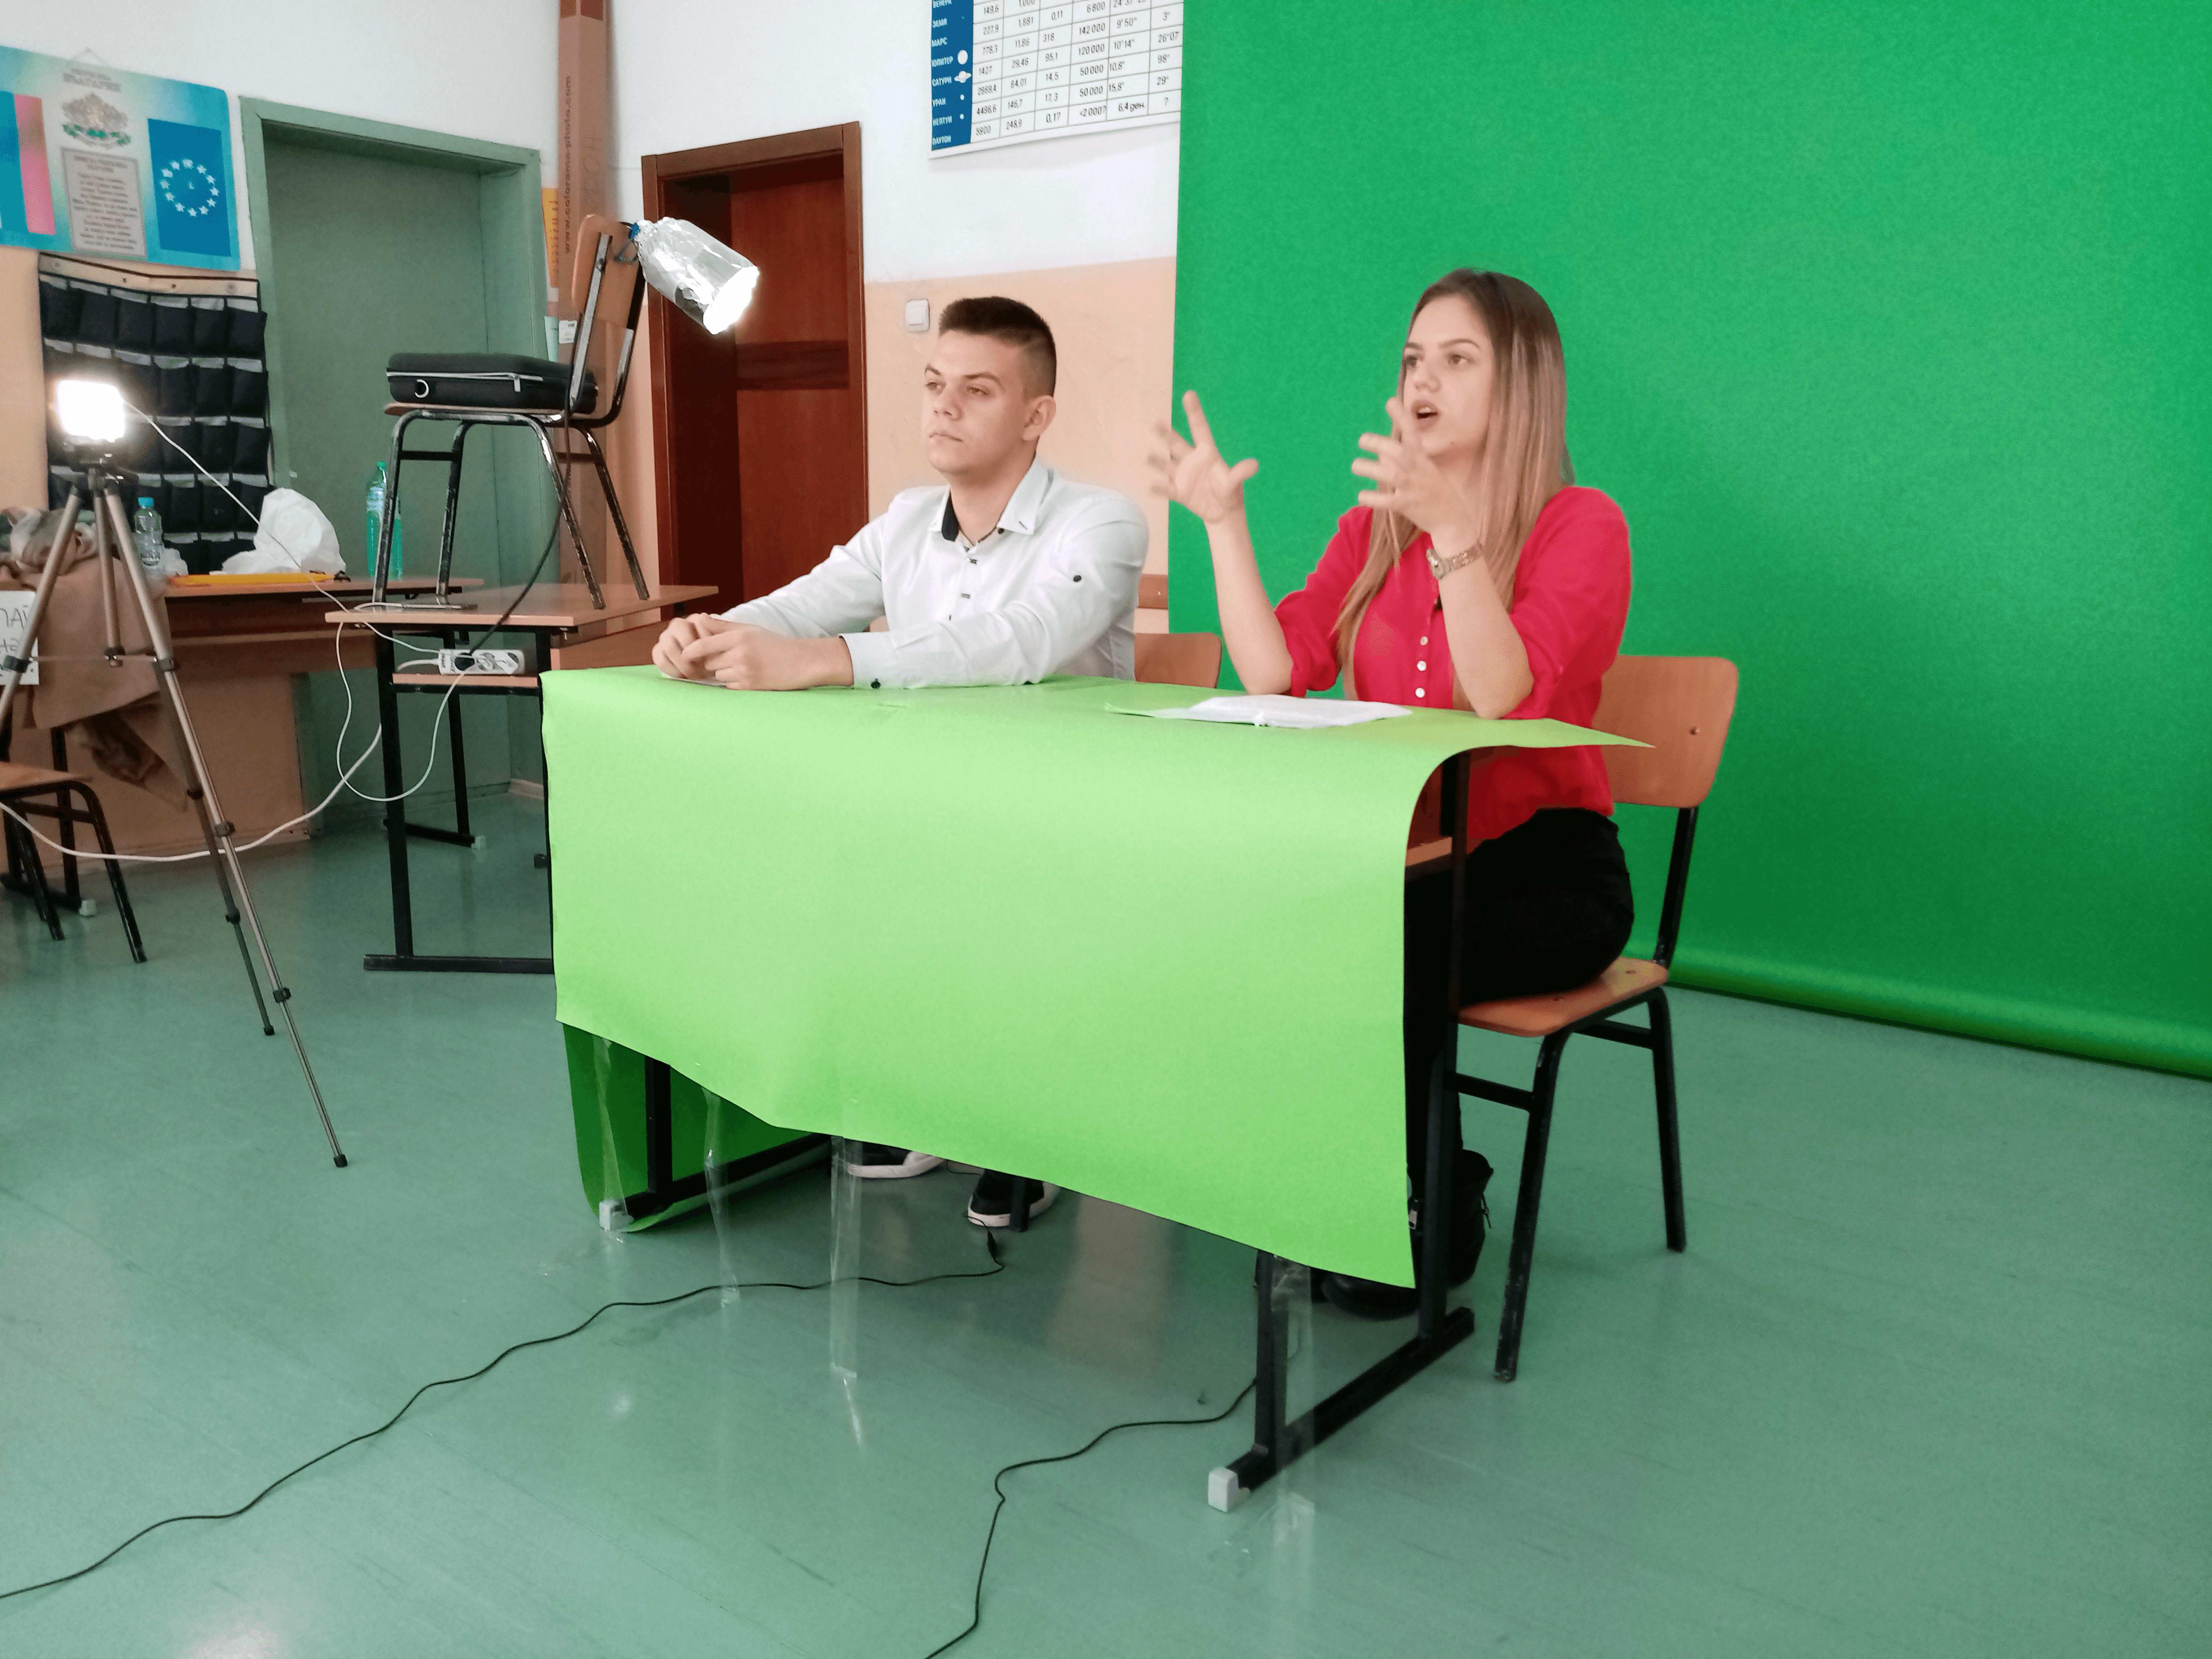 Slide 6 - ППМГ ТВ Сливен - Един ден на снимачната площадка